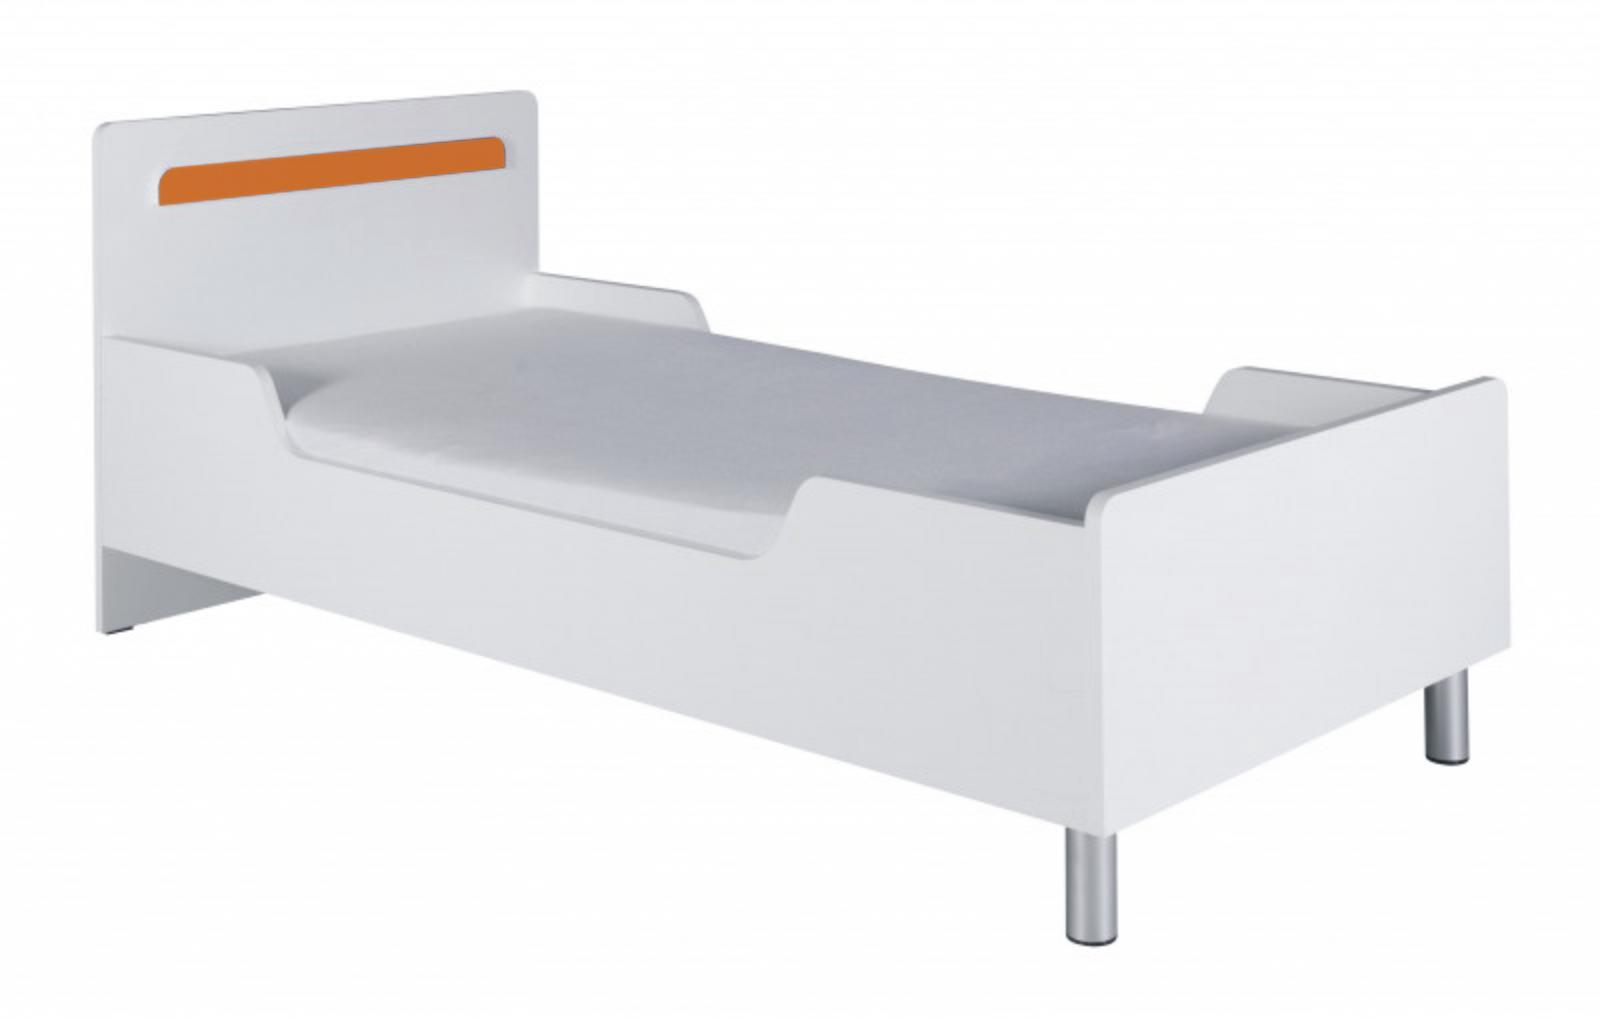 Postel s matrací Neymar R12 90x200 bílá/oranžový lesk